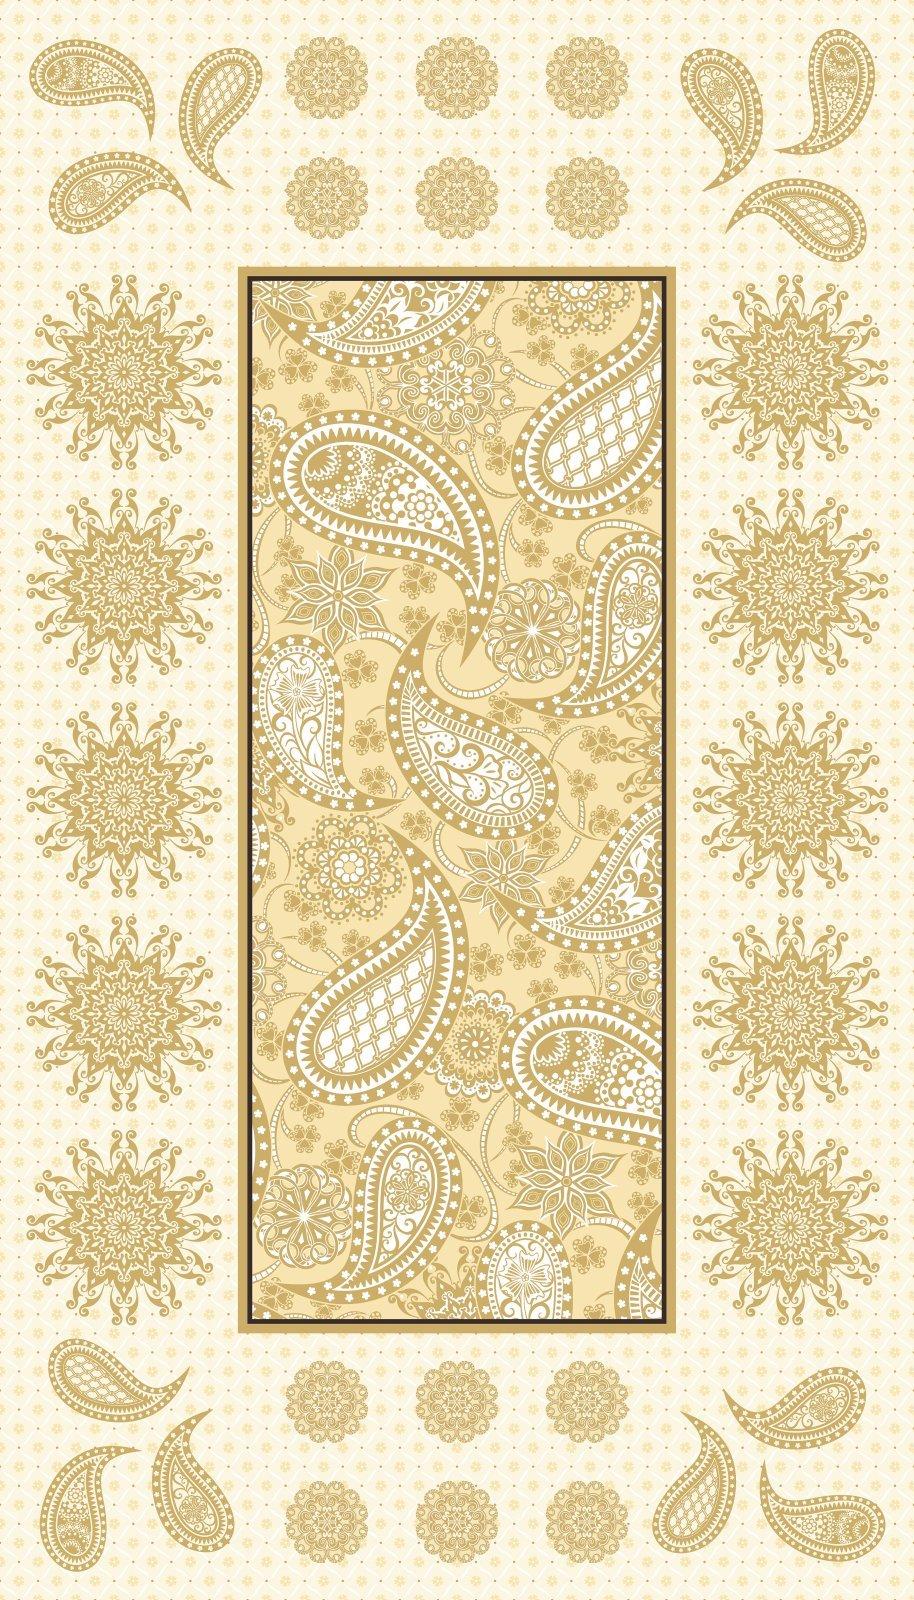 Jubilee Embroidery Panel, Cream